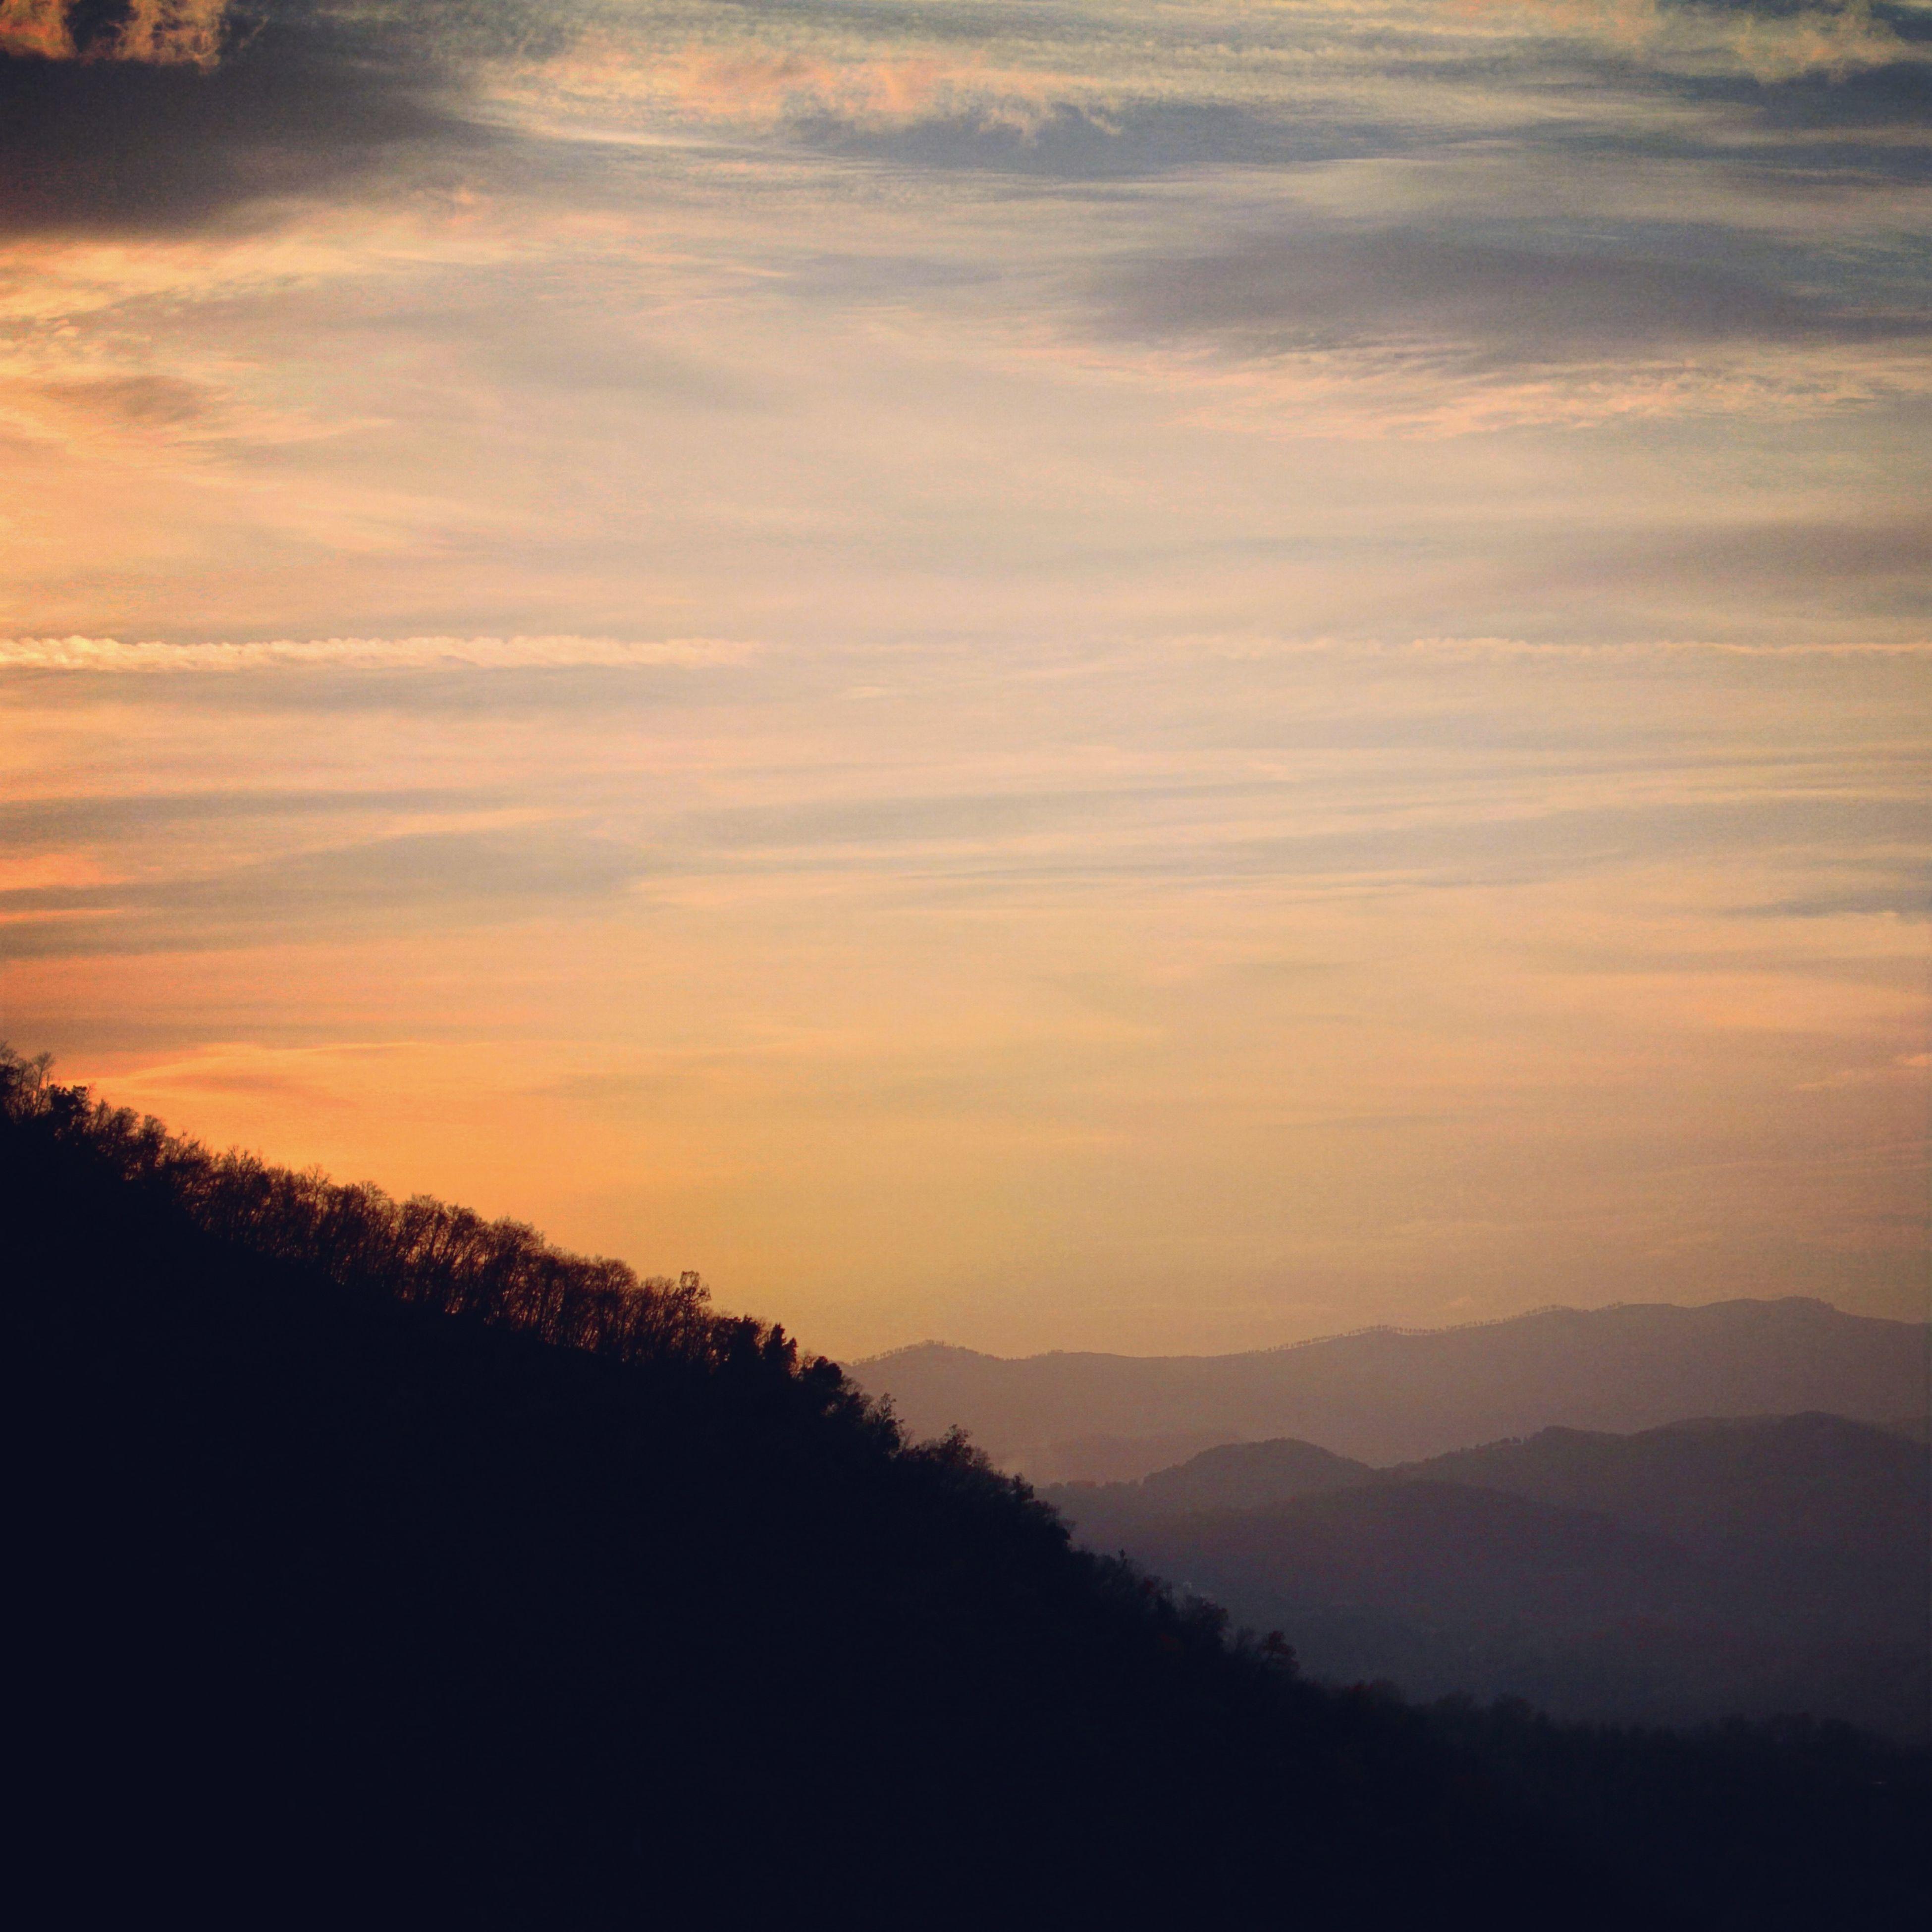 silhouette, scenics, tranquil scene, sunset, tranquility, beauty in nature, sky, mountain, landscape, tree, nature, idyllic, cloud - sky, mountain range, non-urban scene, cloud, orange color, outdoors, no people, dusk